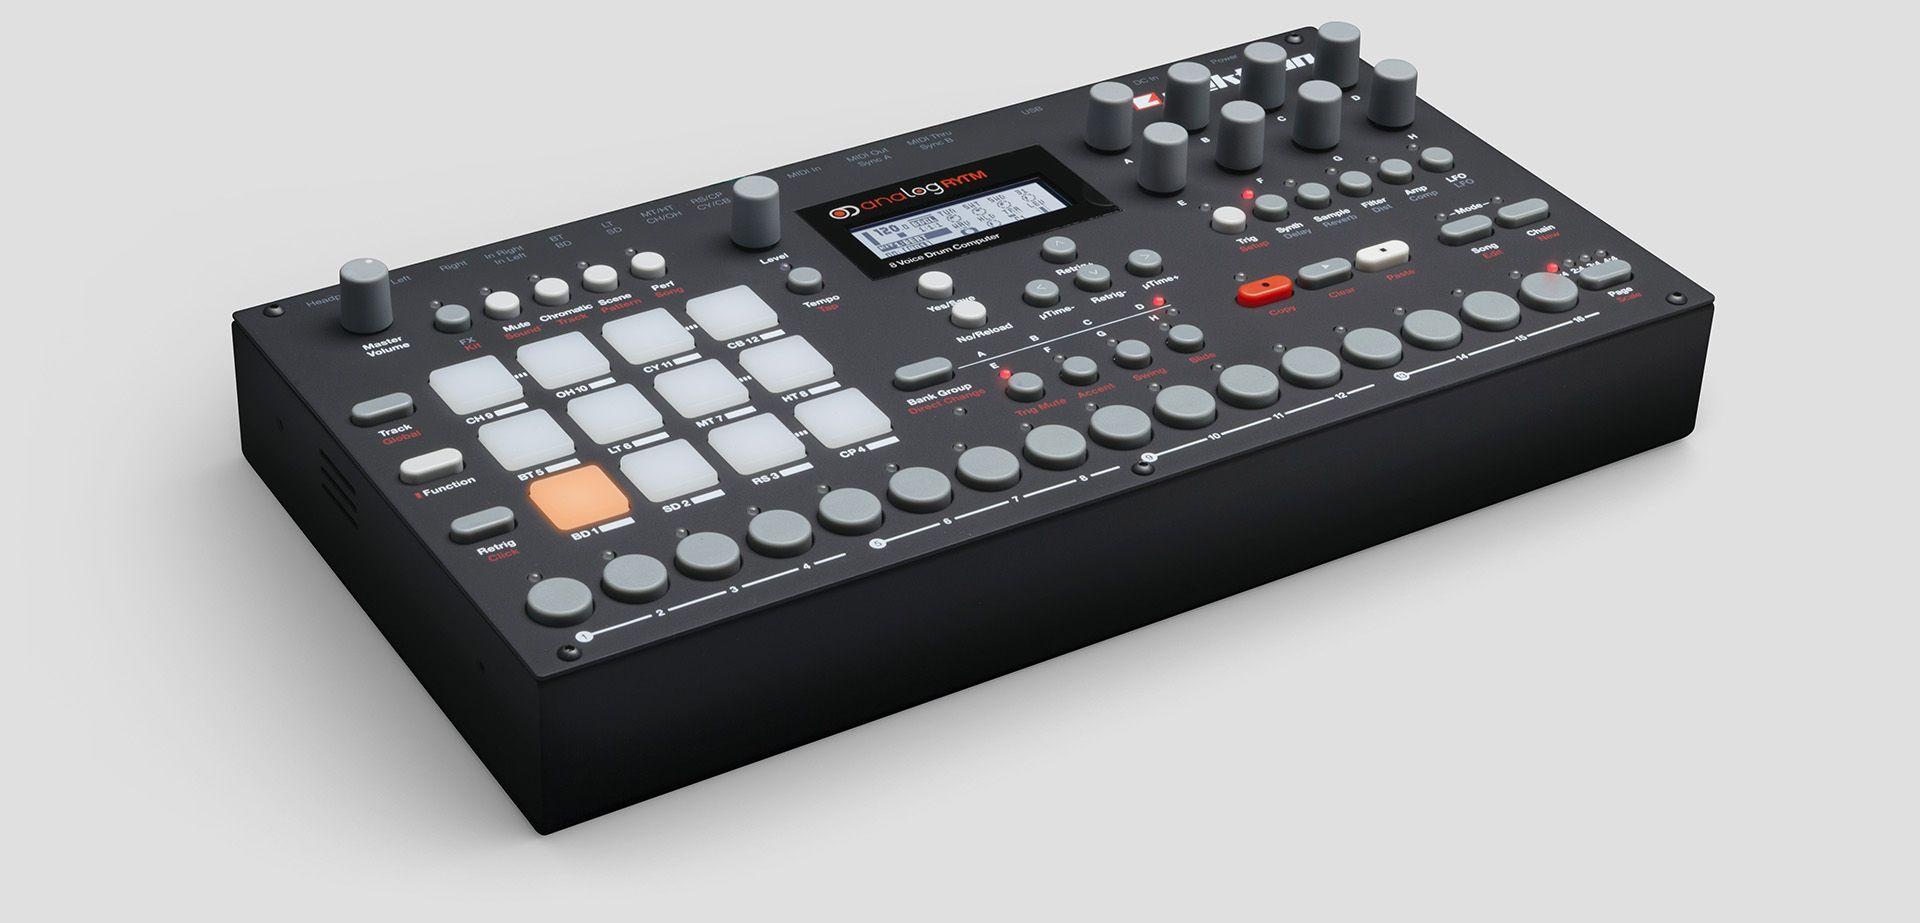 elektron analog rytm analog drum machine with sample support synthesizers drum machine. Black Bedroom Furniture Sets. Home Design Ideas